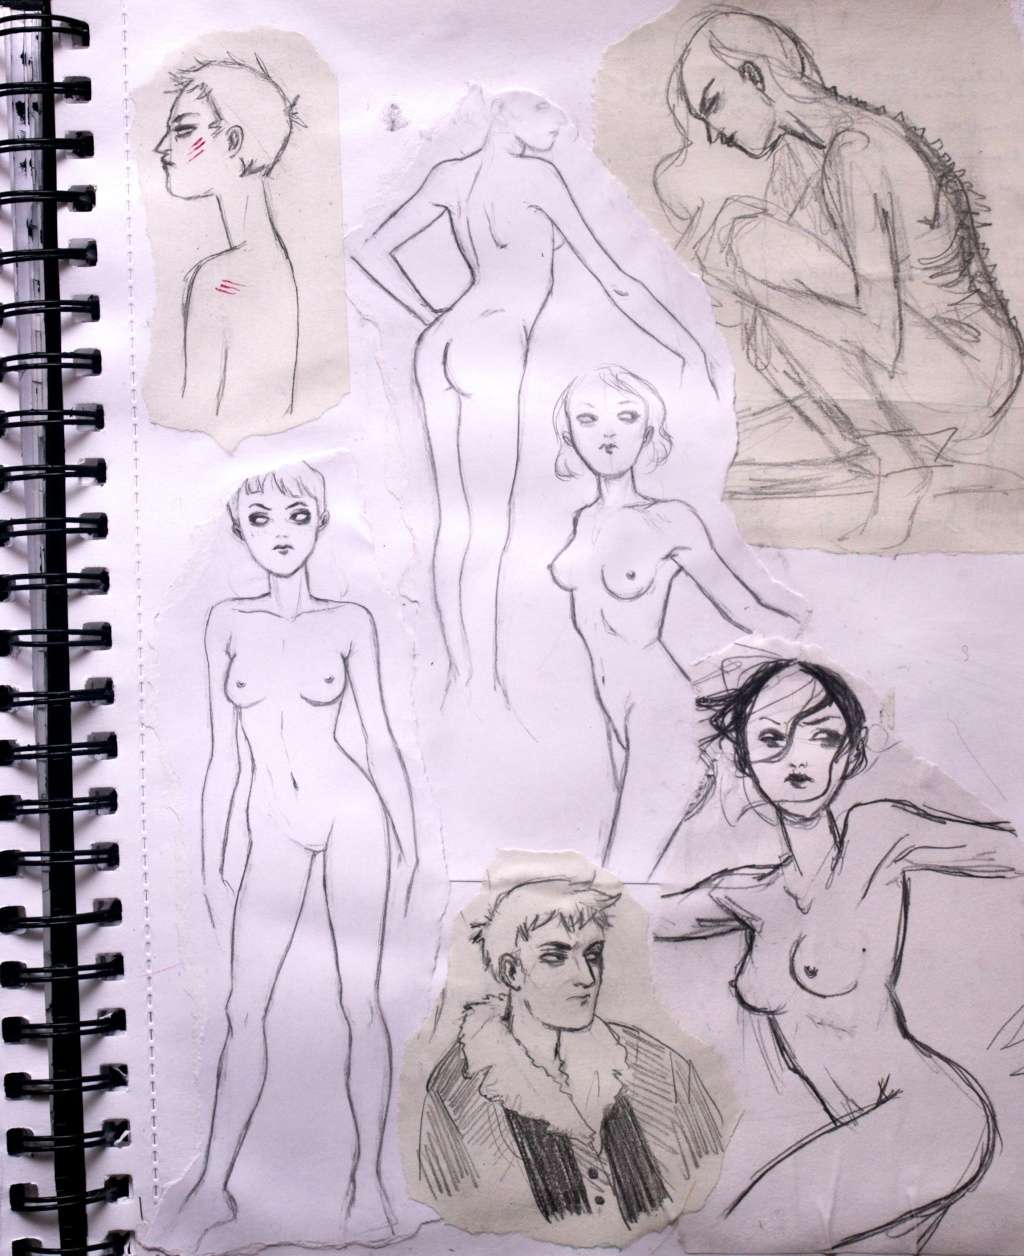 -La Galerie d'Okhamii- - Page 7 Imgp8417